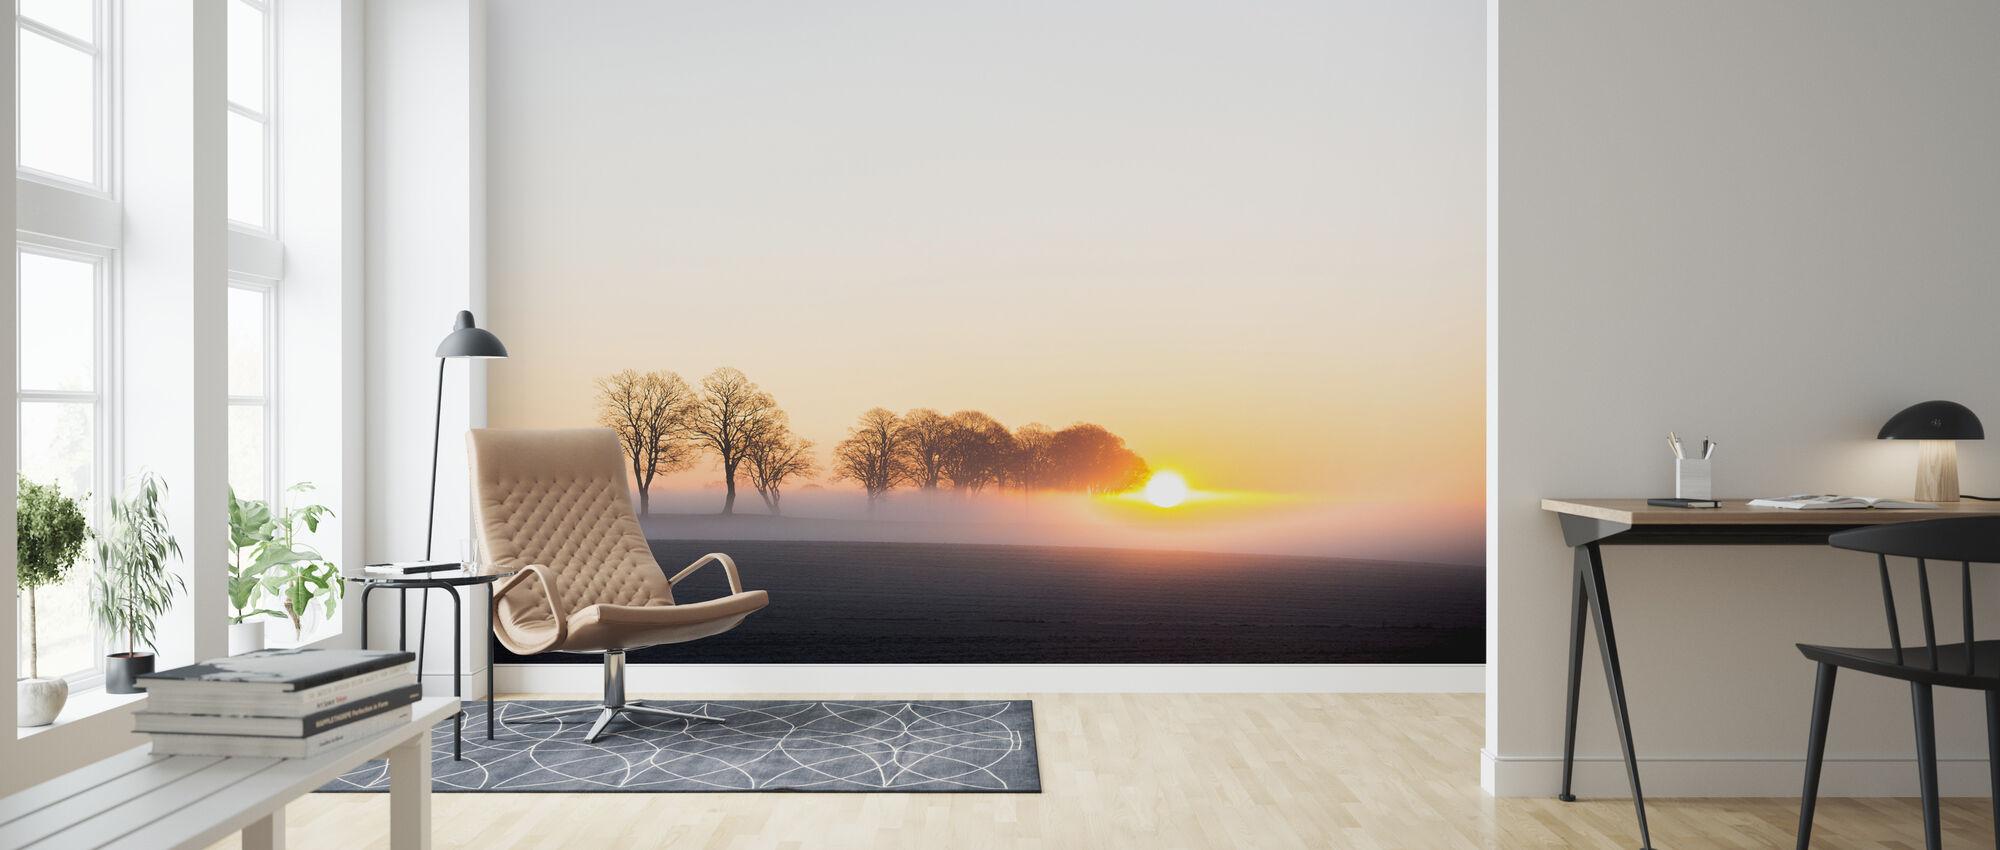 Vakna upp i Sverige - Tapet - Vardagsrum